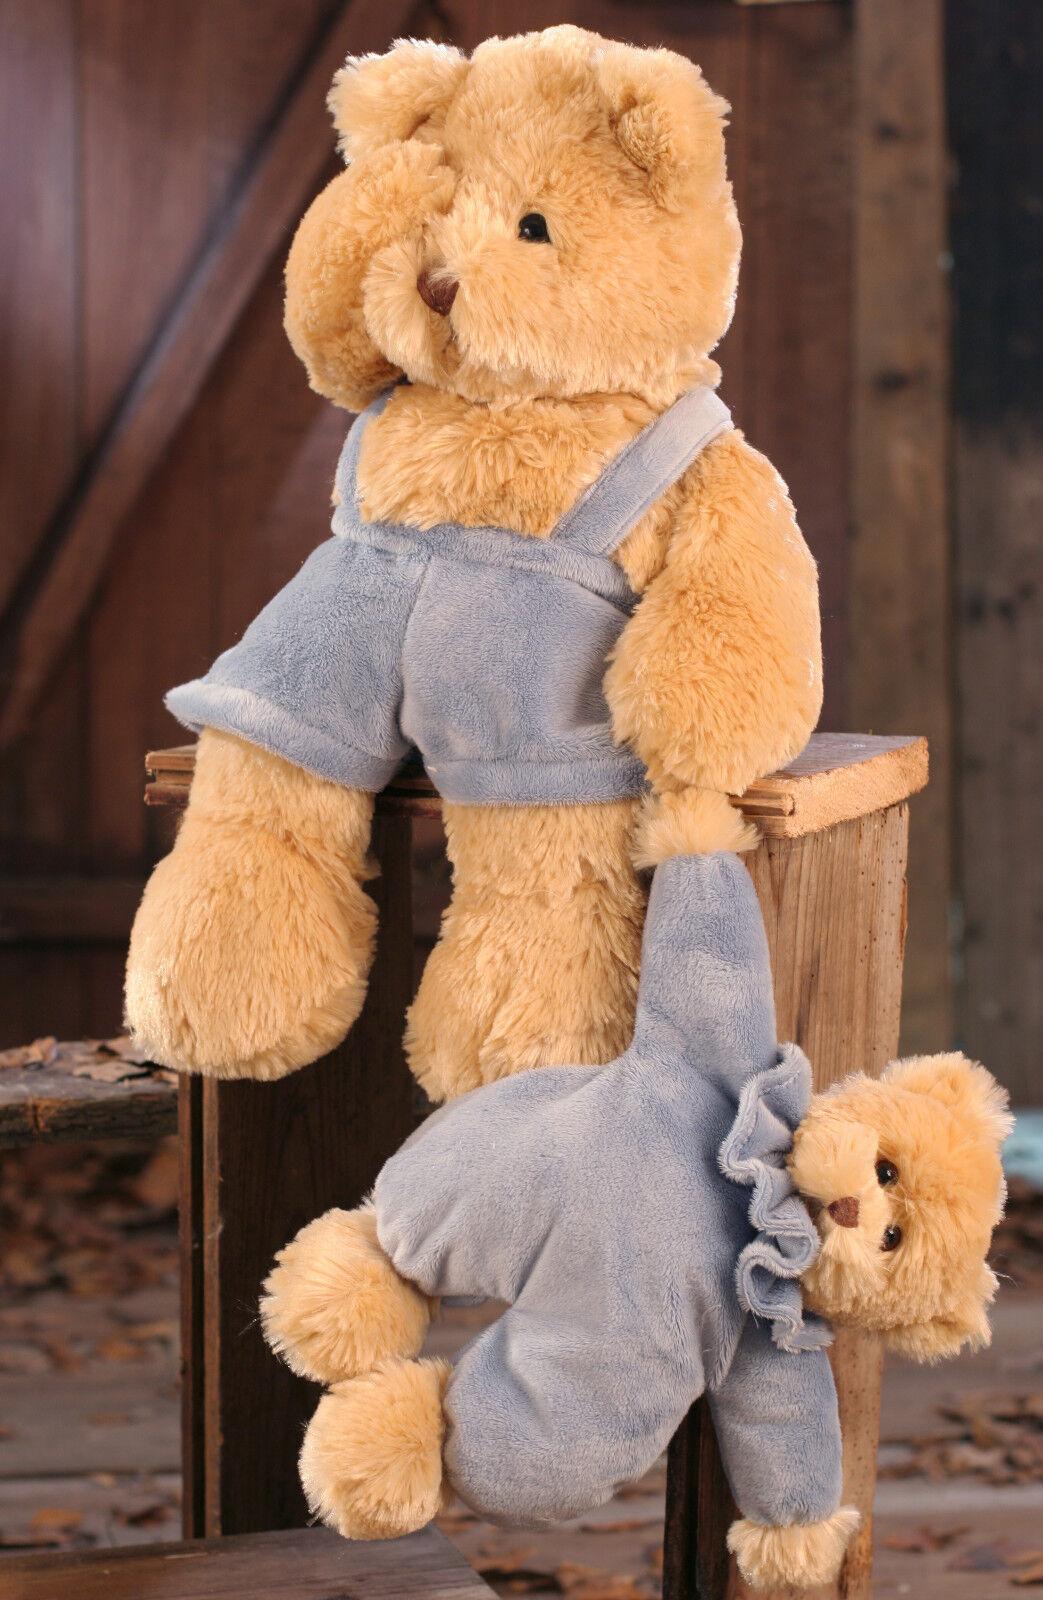 Teddy Bear 'Chandler & Bobo' Settler Bears Handmade Collectable Boy Gift 44cms